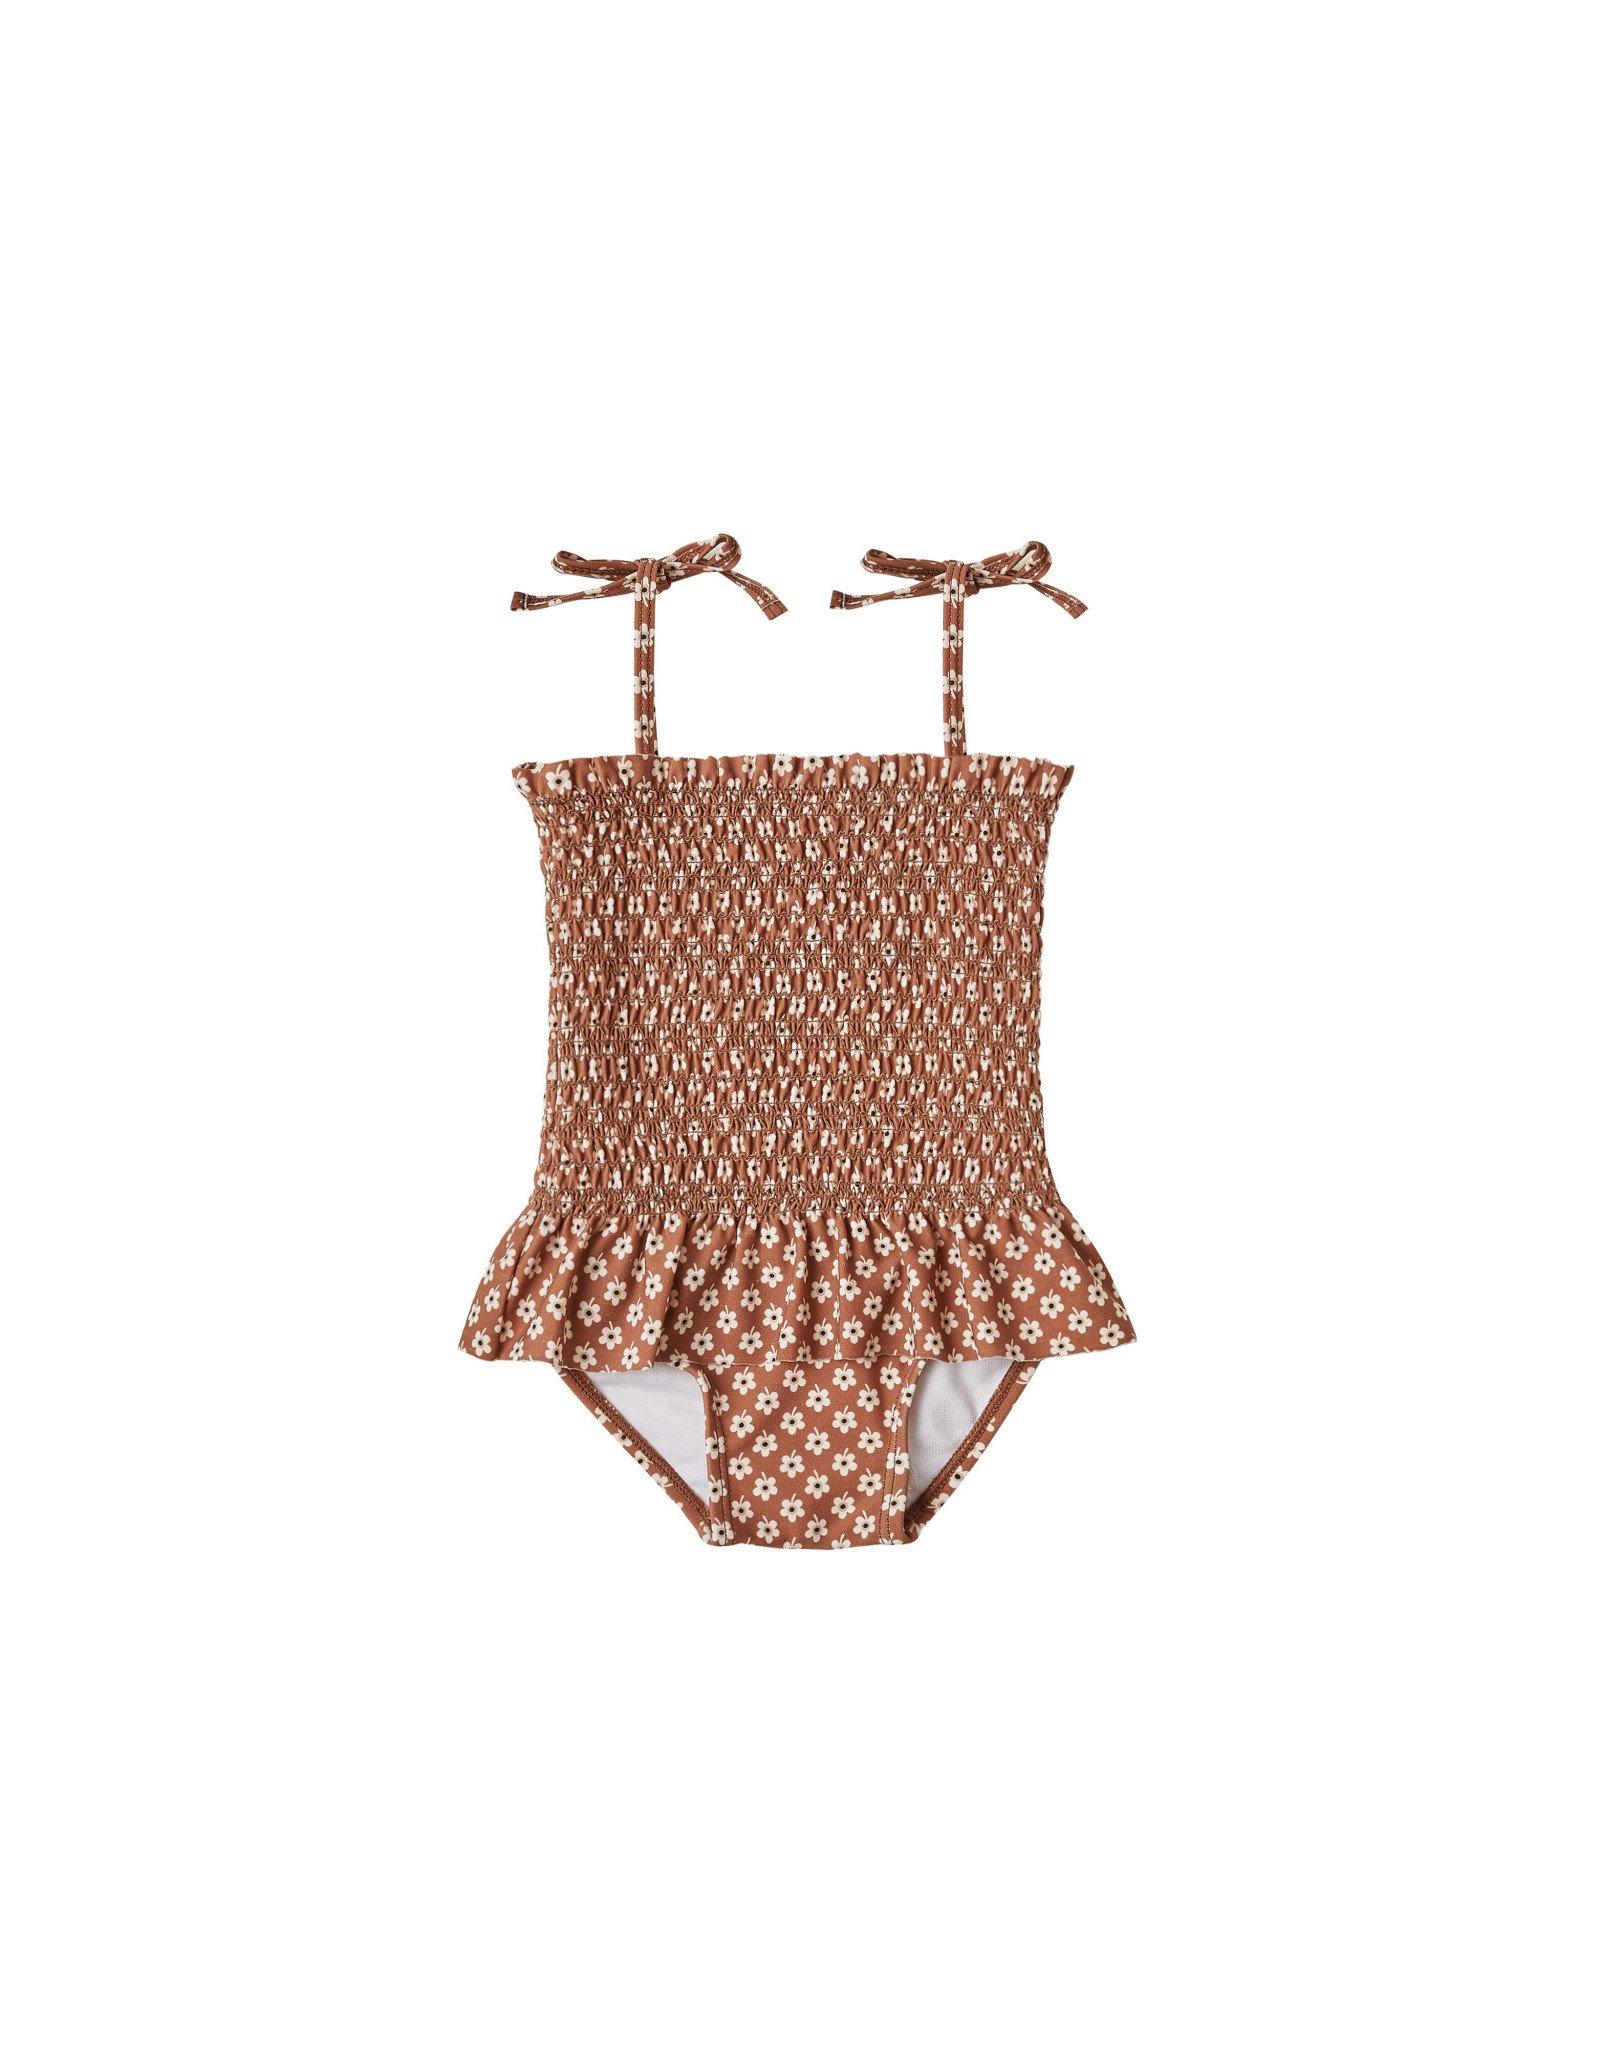 Rylee + Cru Smocked Skirted One Piece Swimsuit, Flower Power